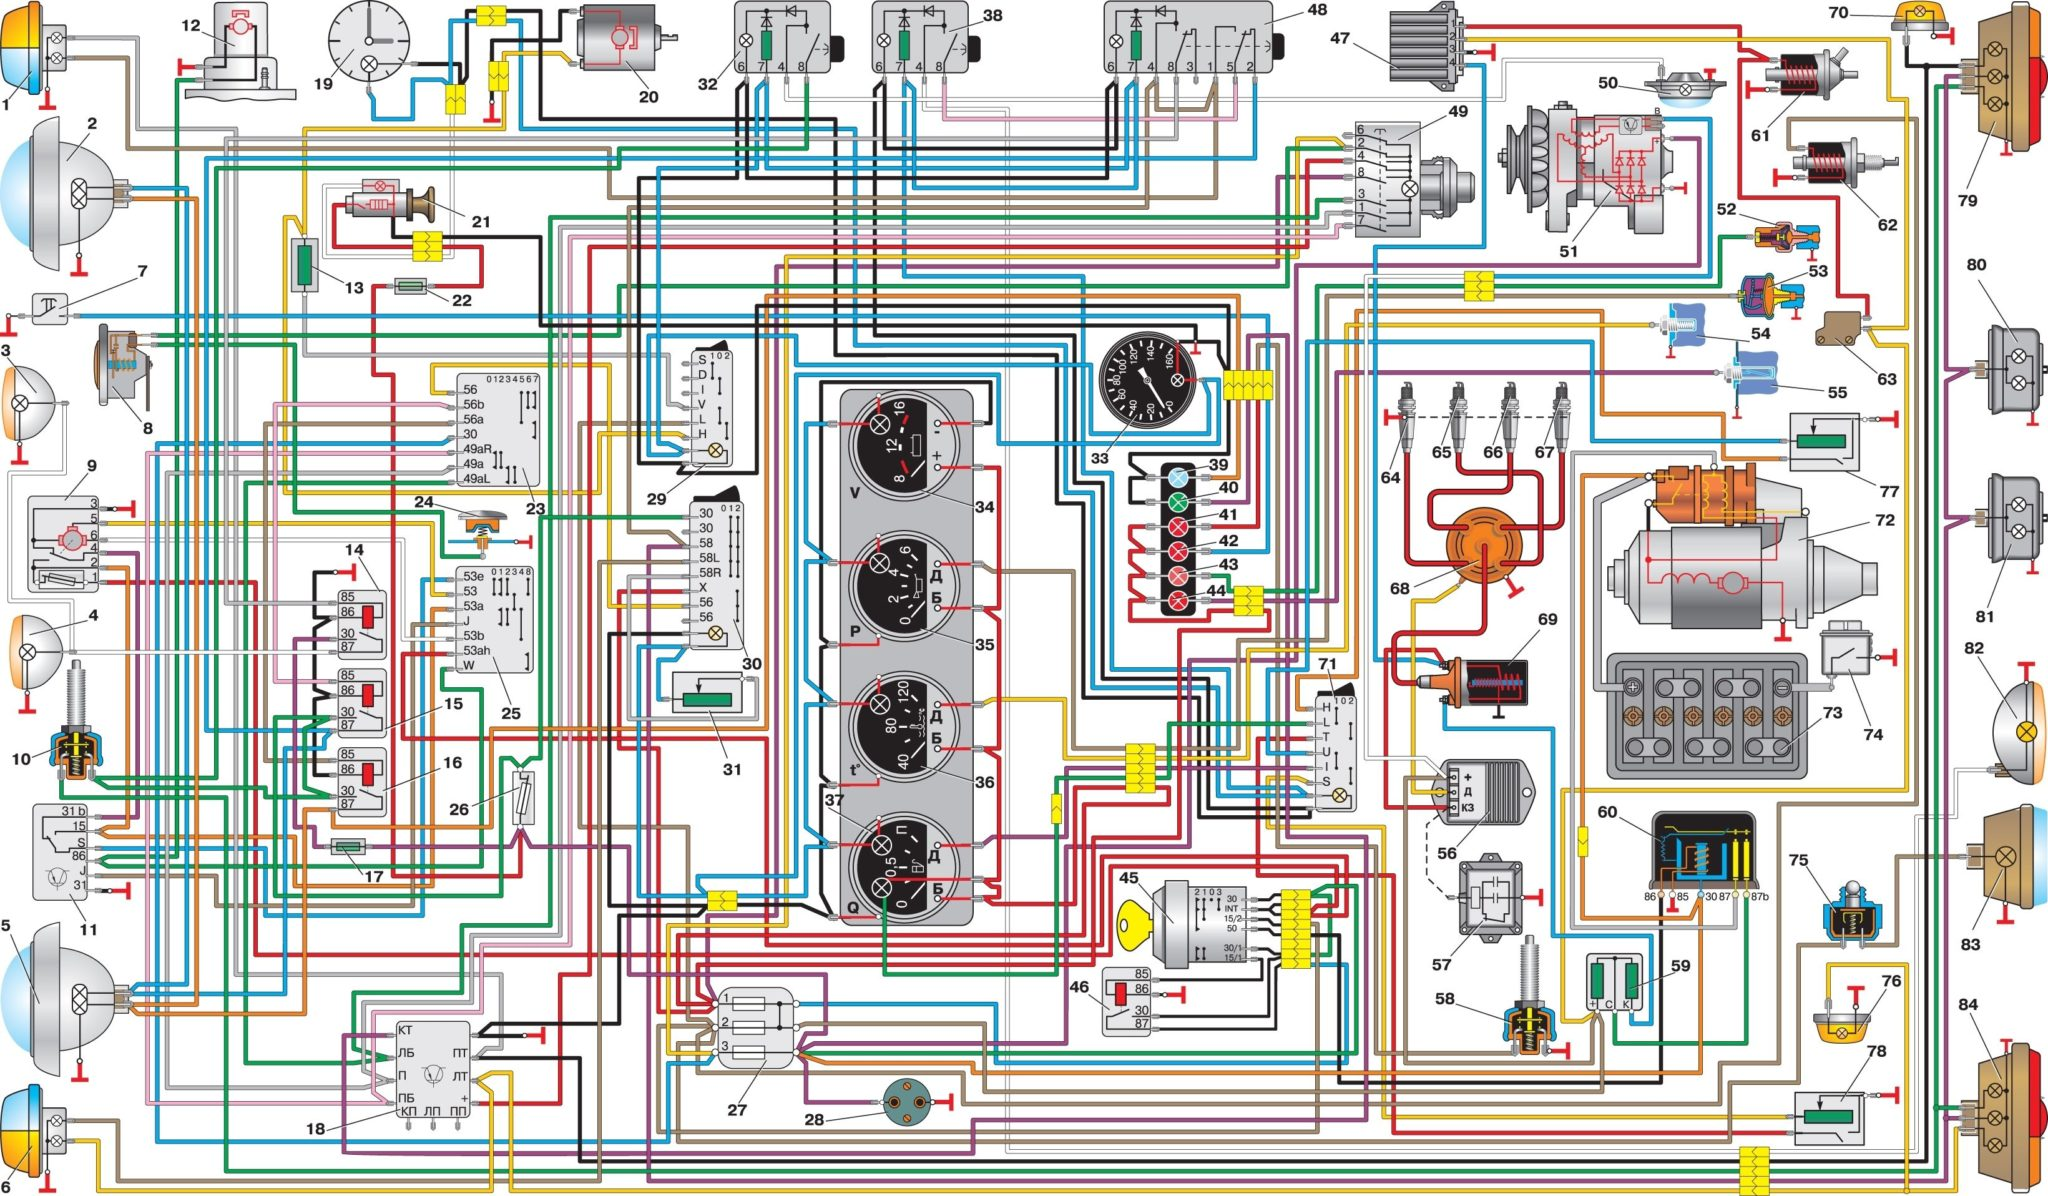 Уаз 3909 схема электрооборудования